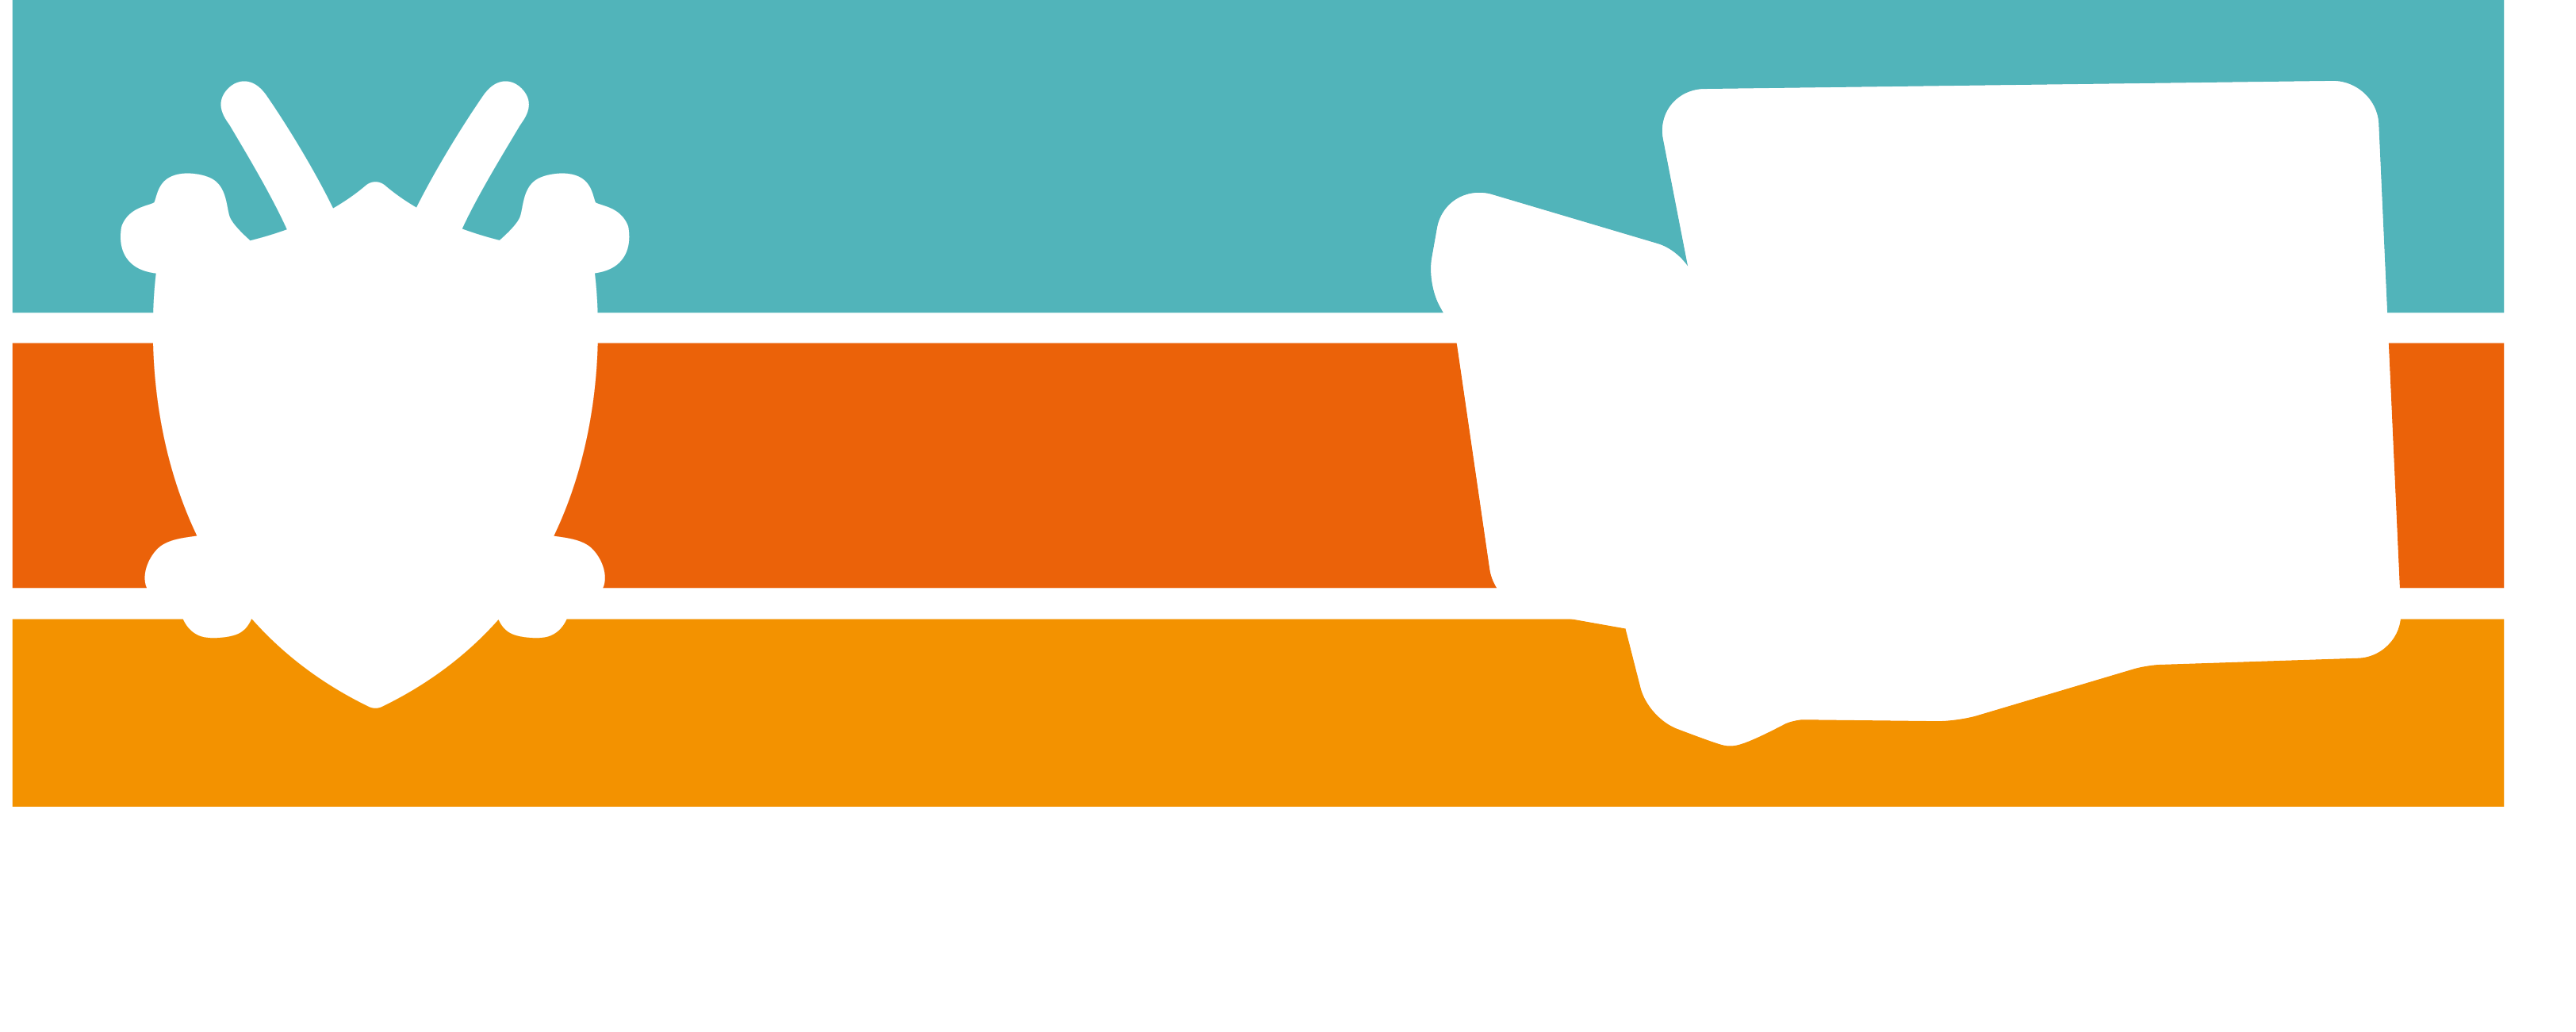 Create an innovative spin on Locust Cider Colorado t shirt